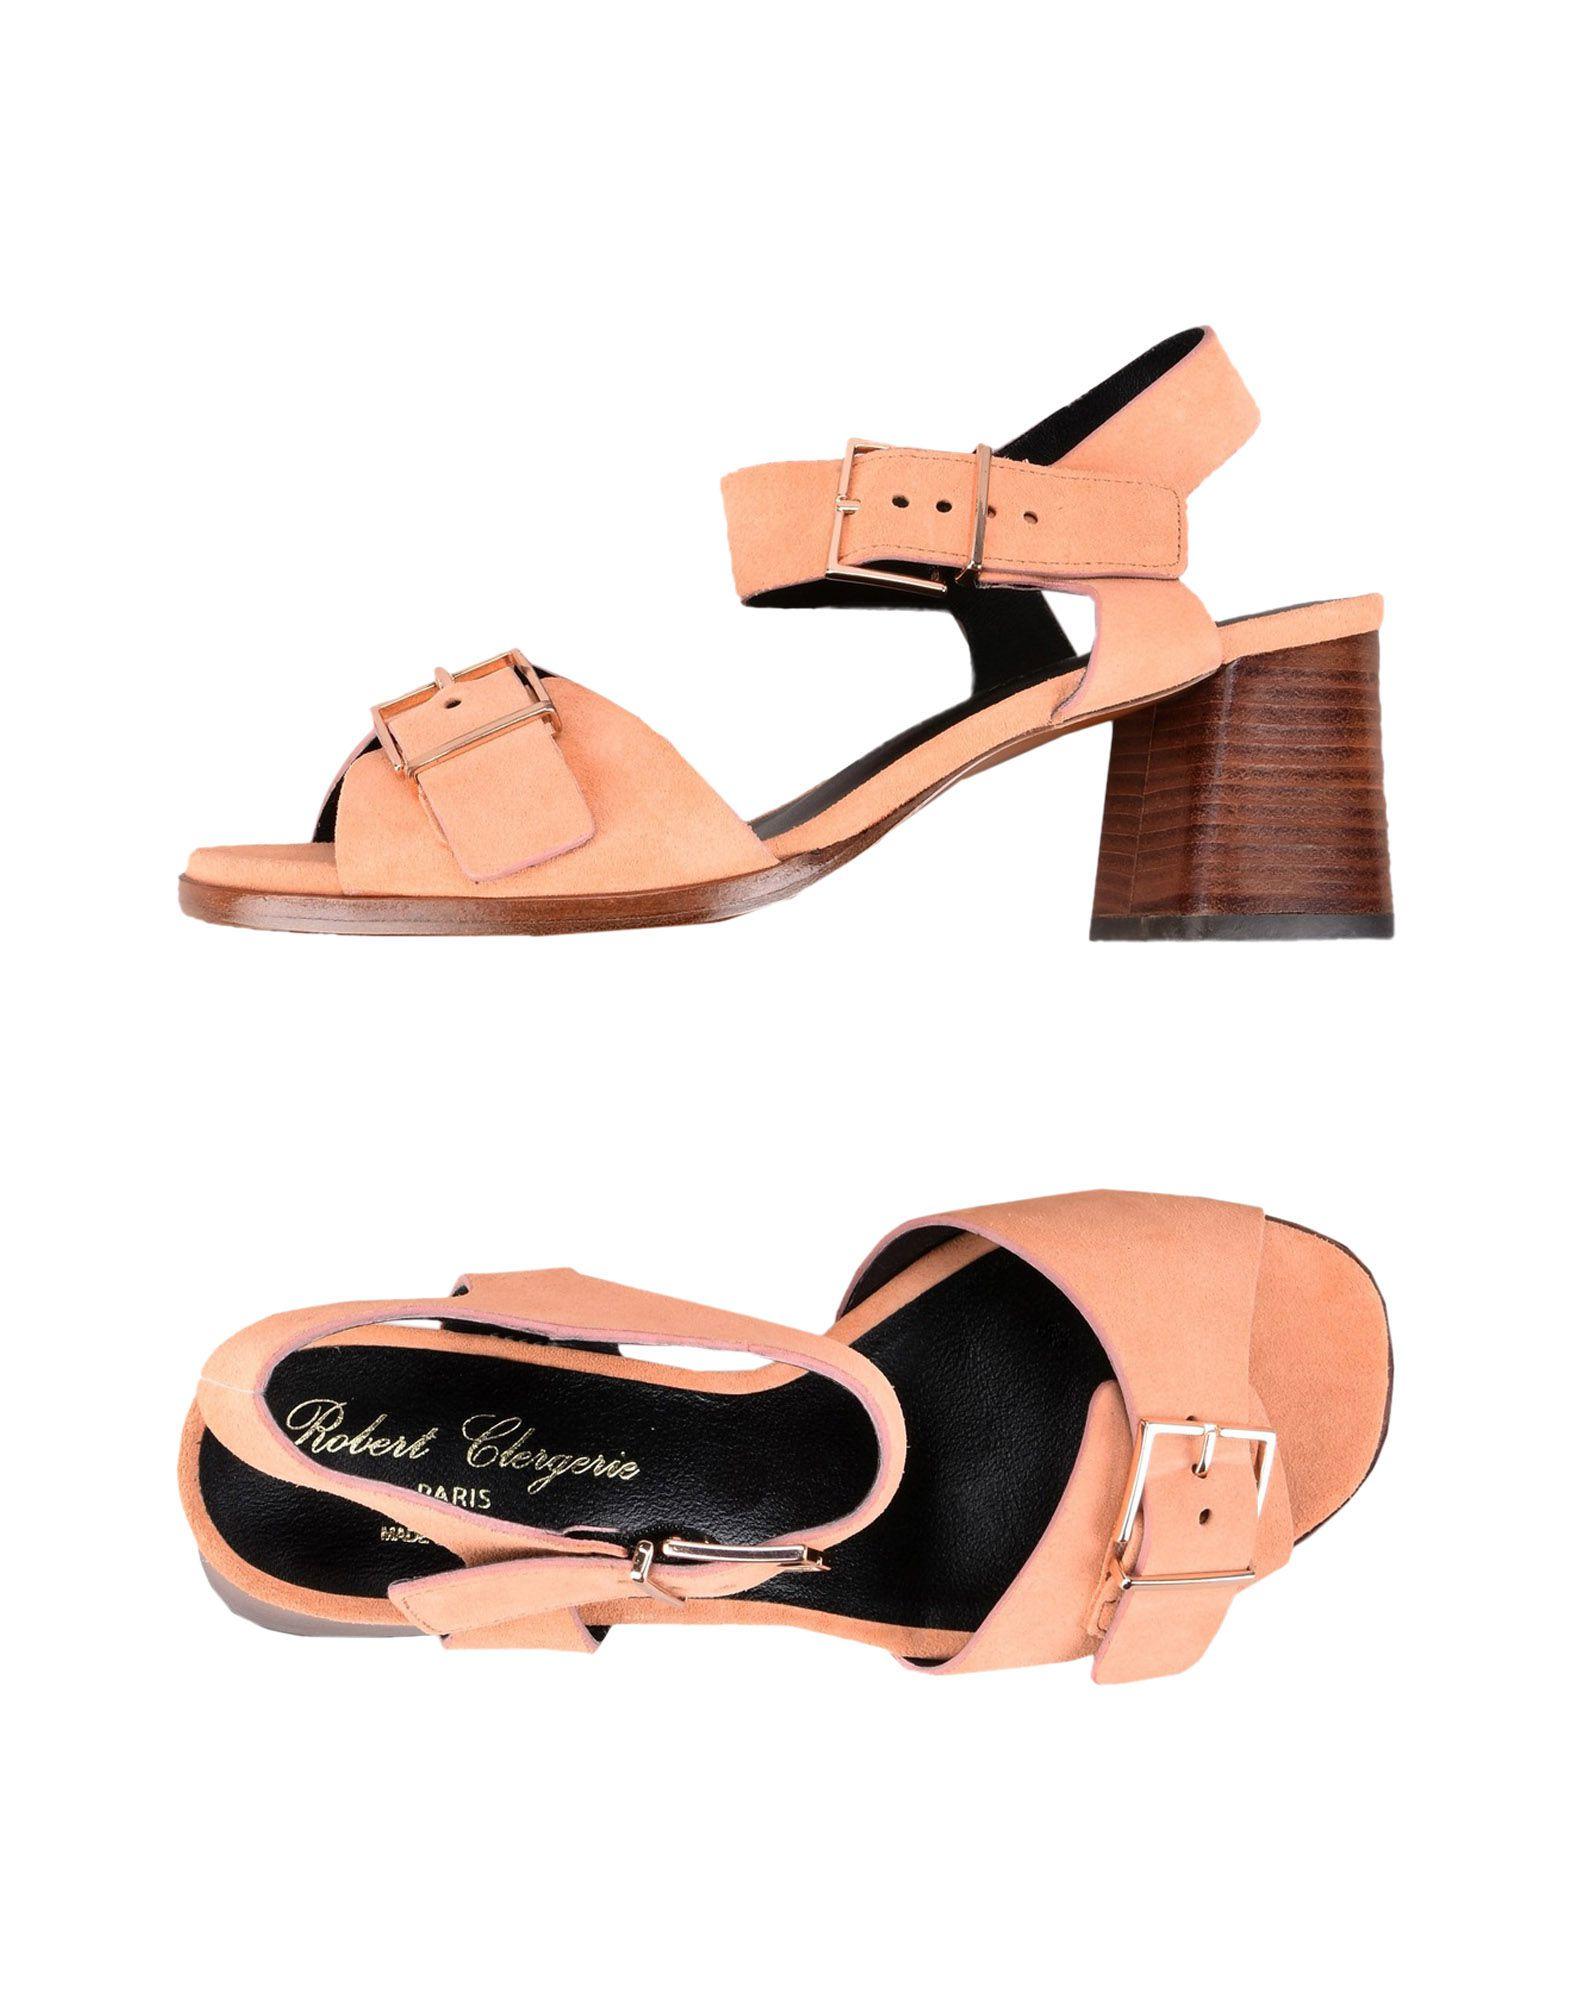 Stilvolle billige Schuhe Robert Clergerie Sandalen Damen  11381506MJ